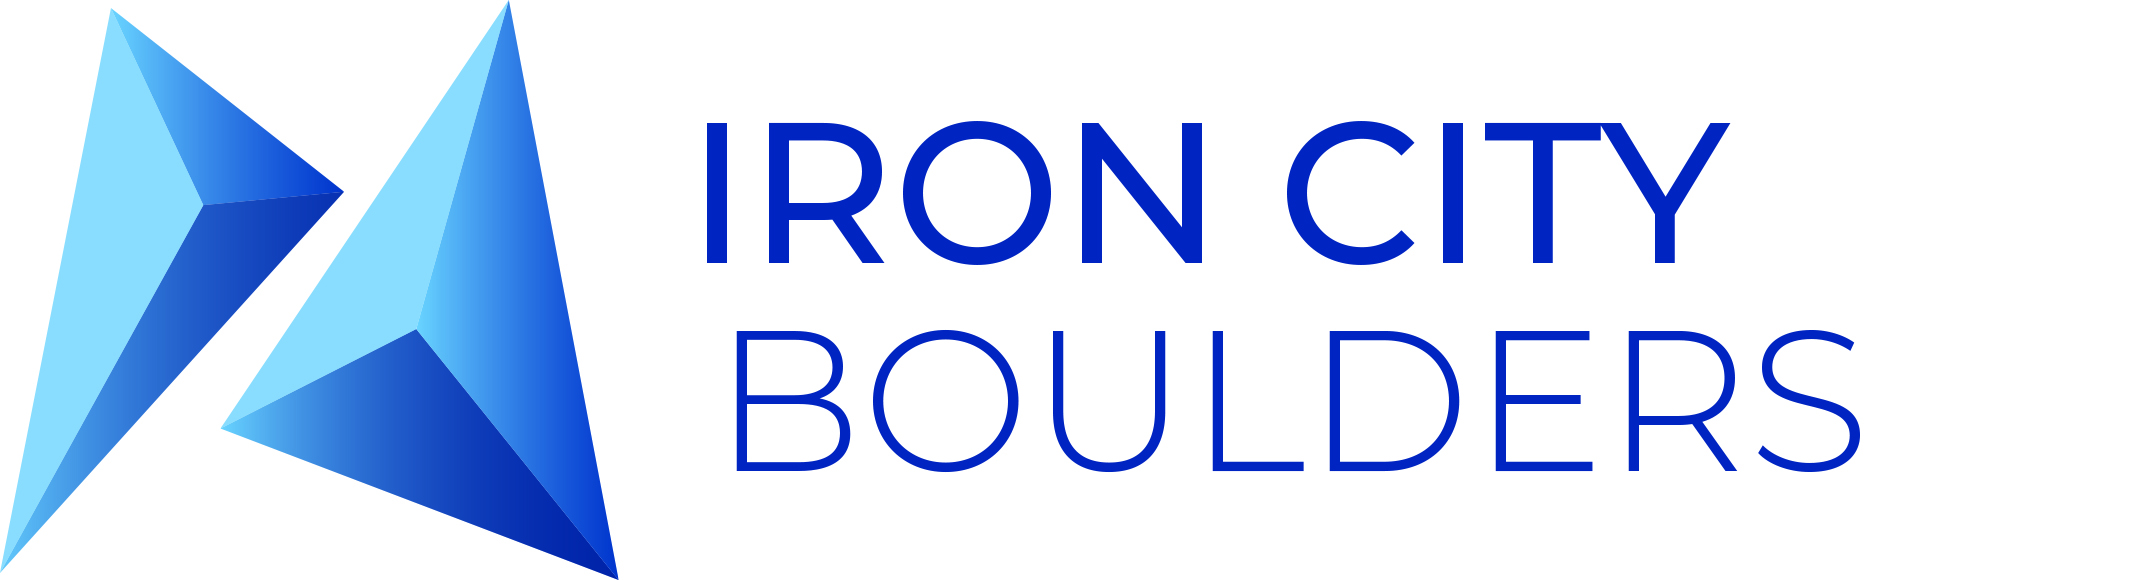 Iron City Boulders